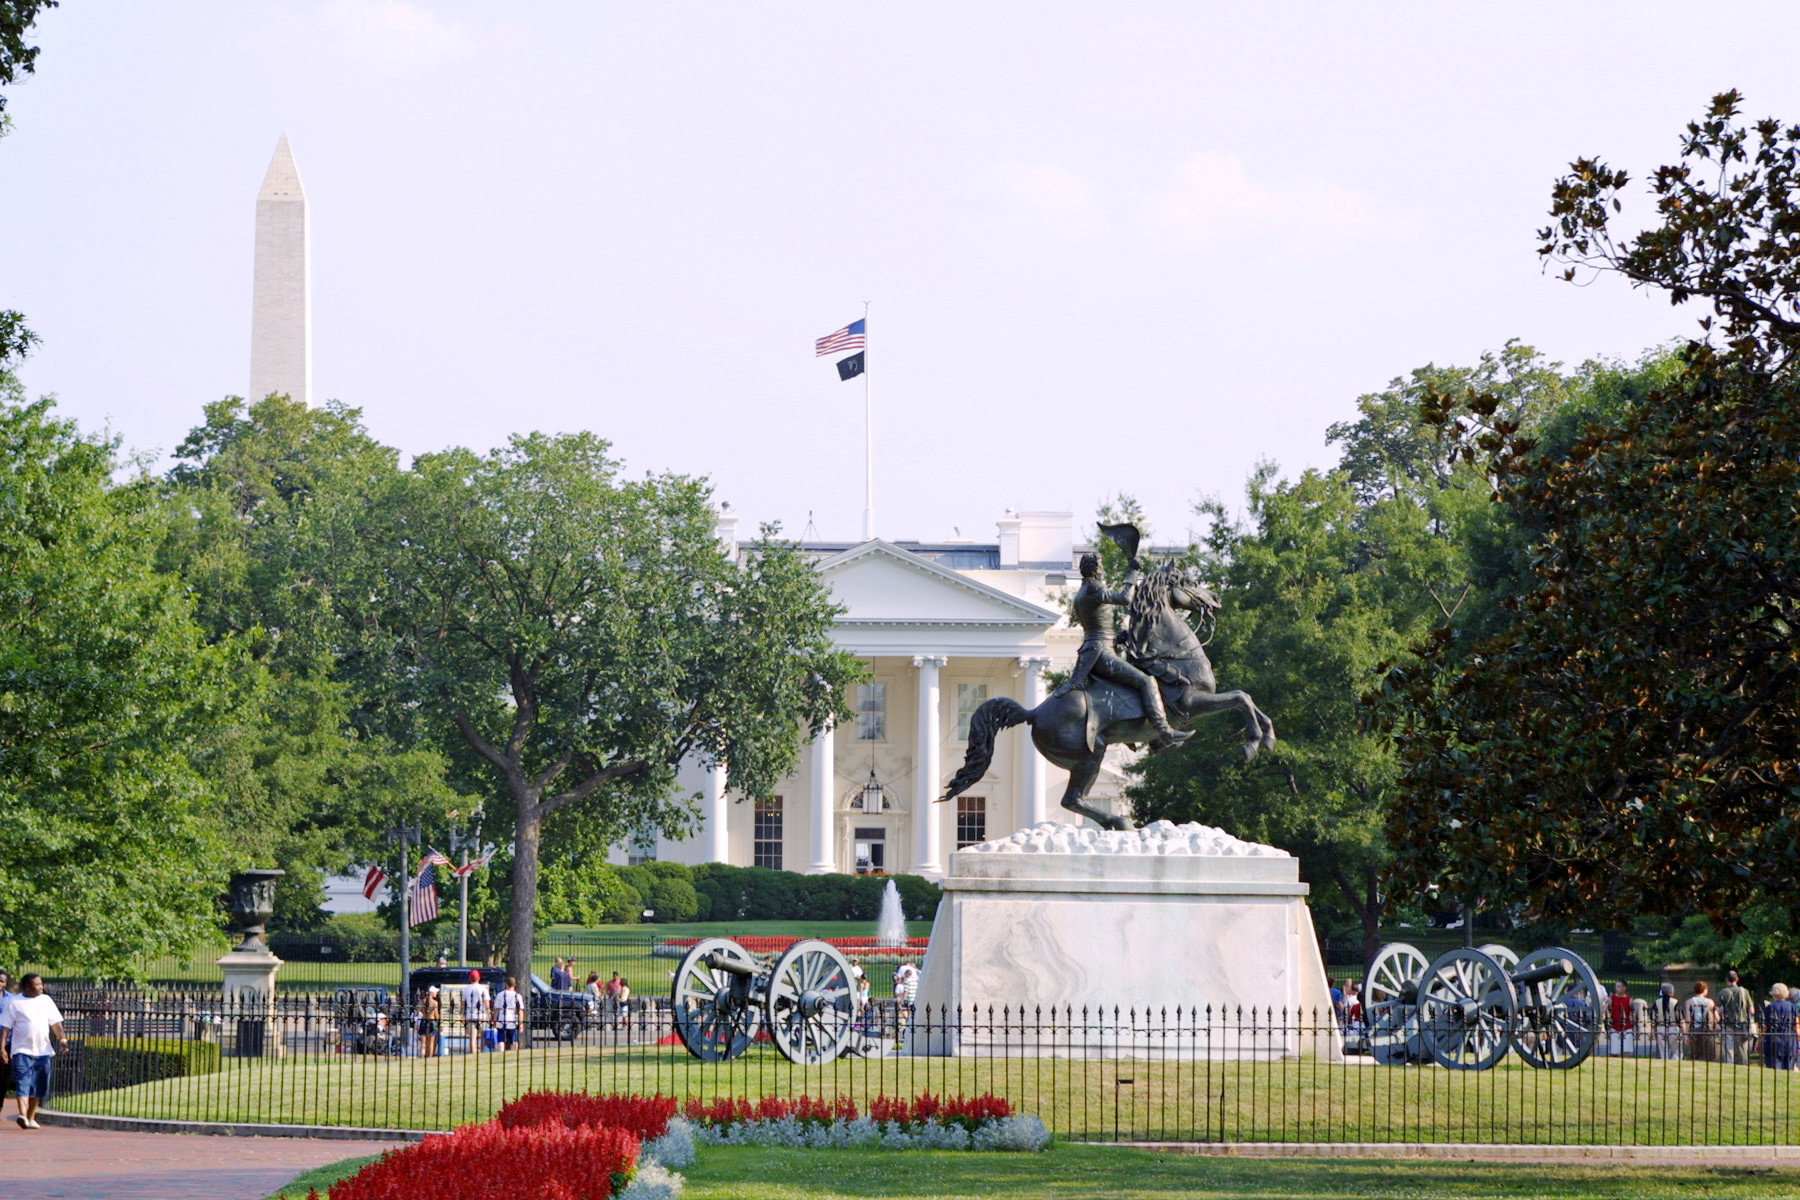 Architecture Buildings Historic Landmarks Scenic views tree sky grass landmark monument memorial town square park